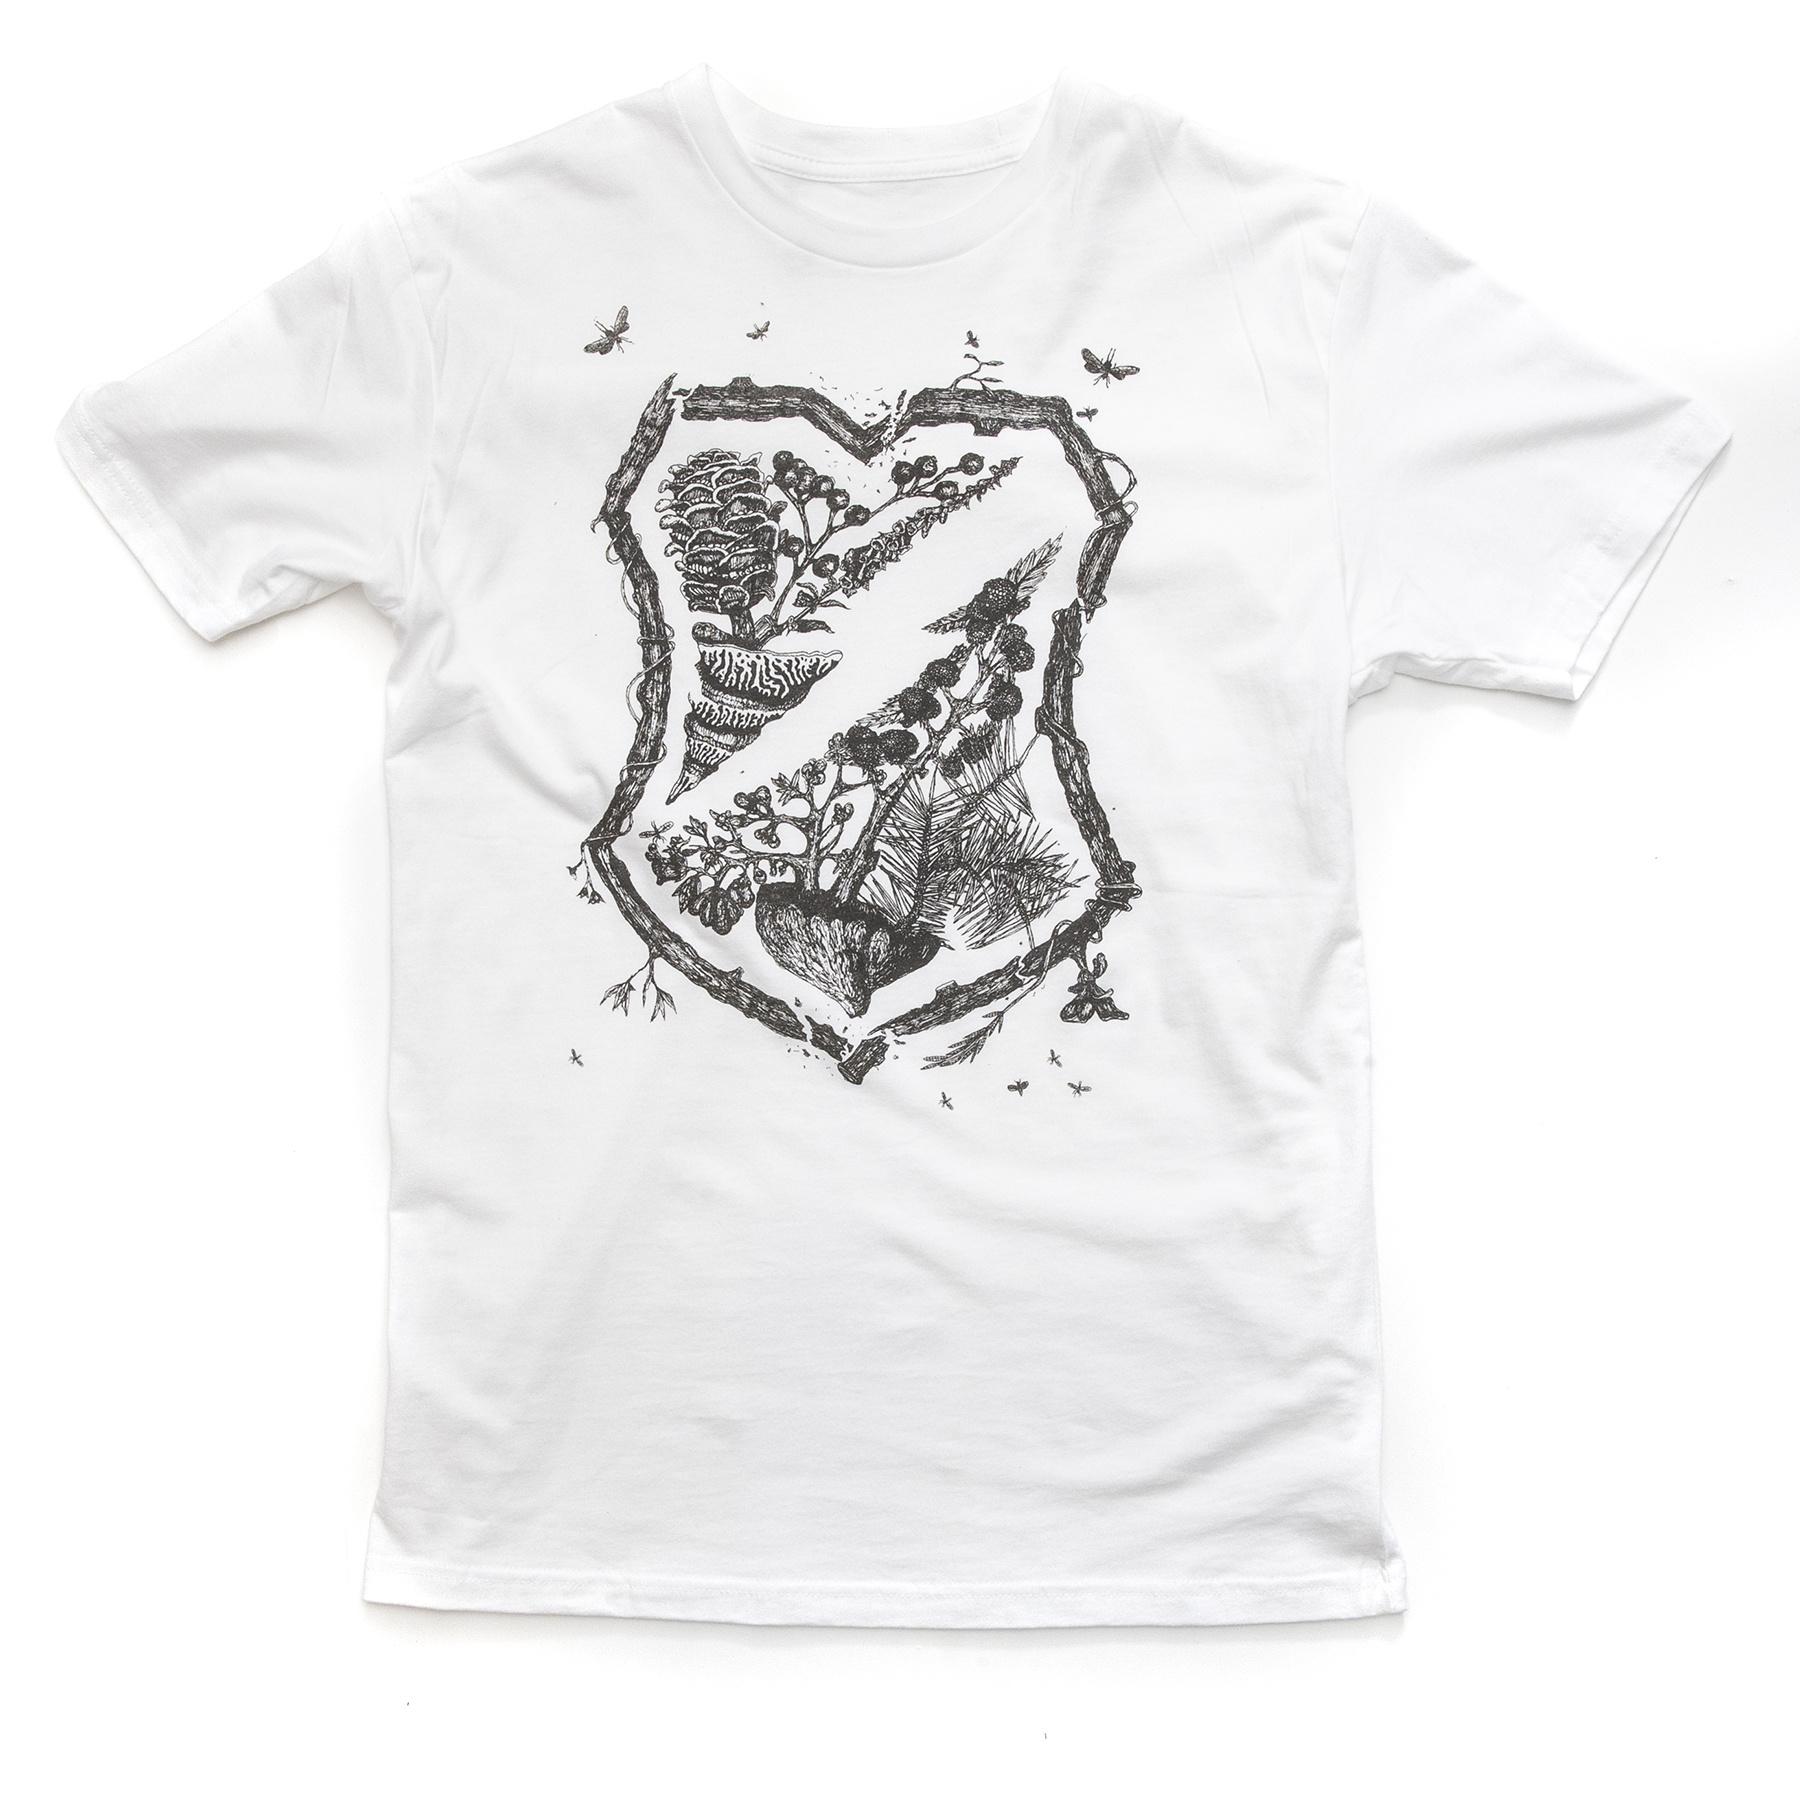 MASH CCC Shirt White